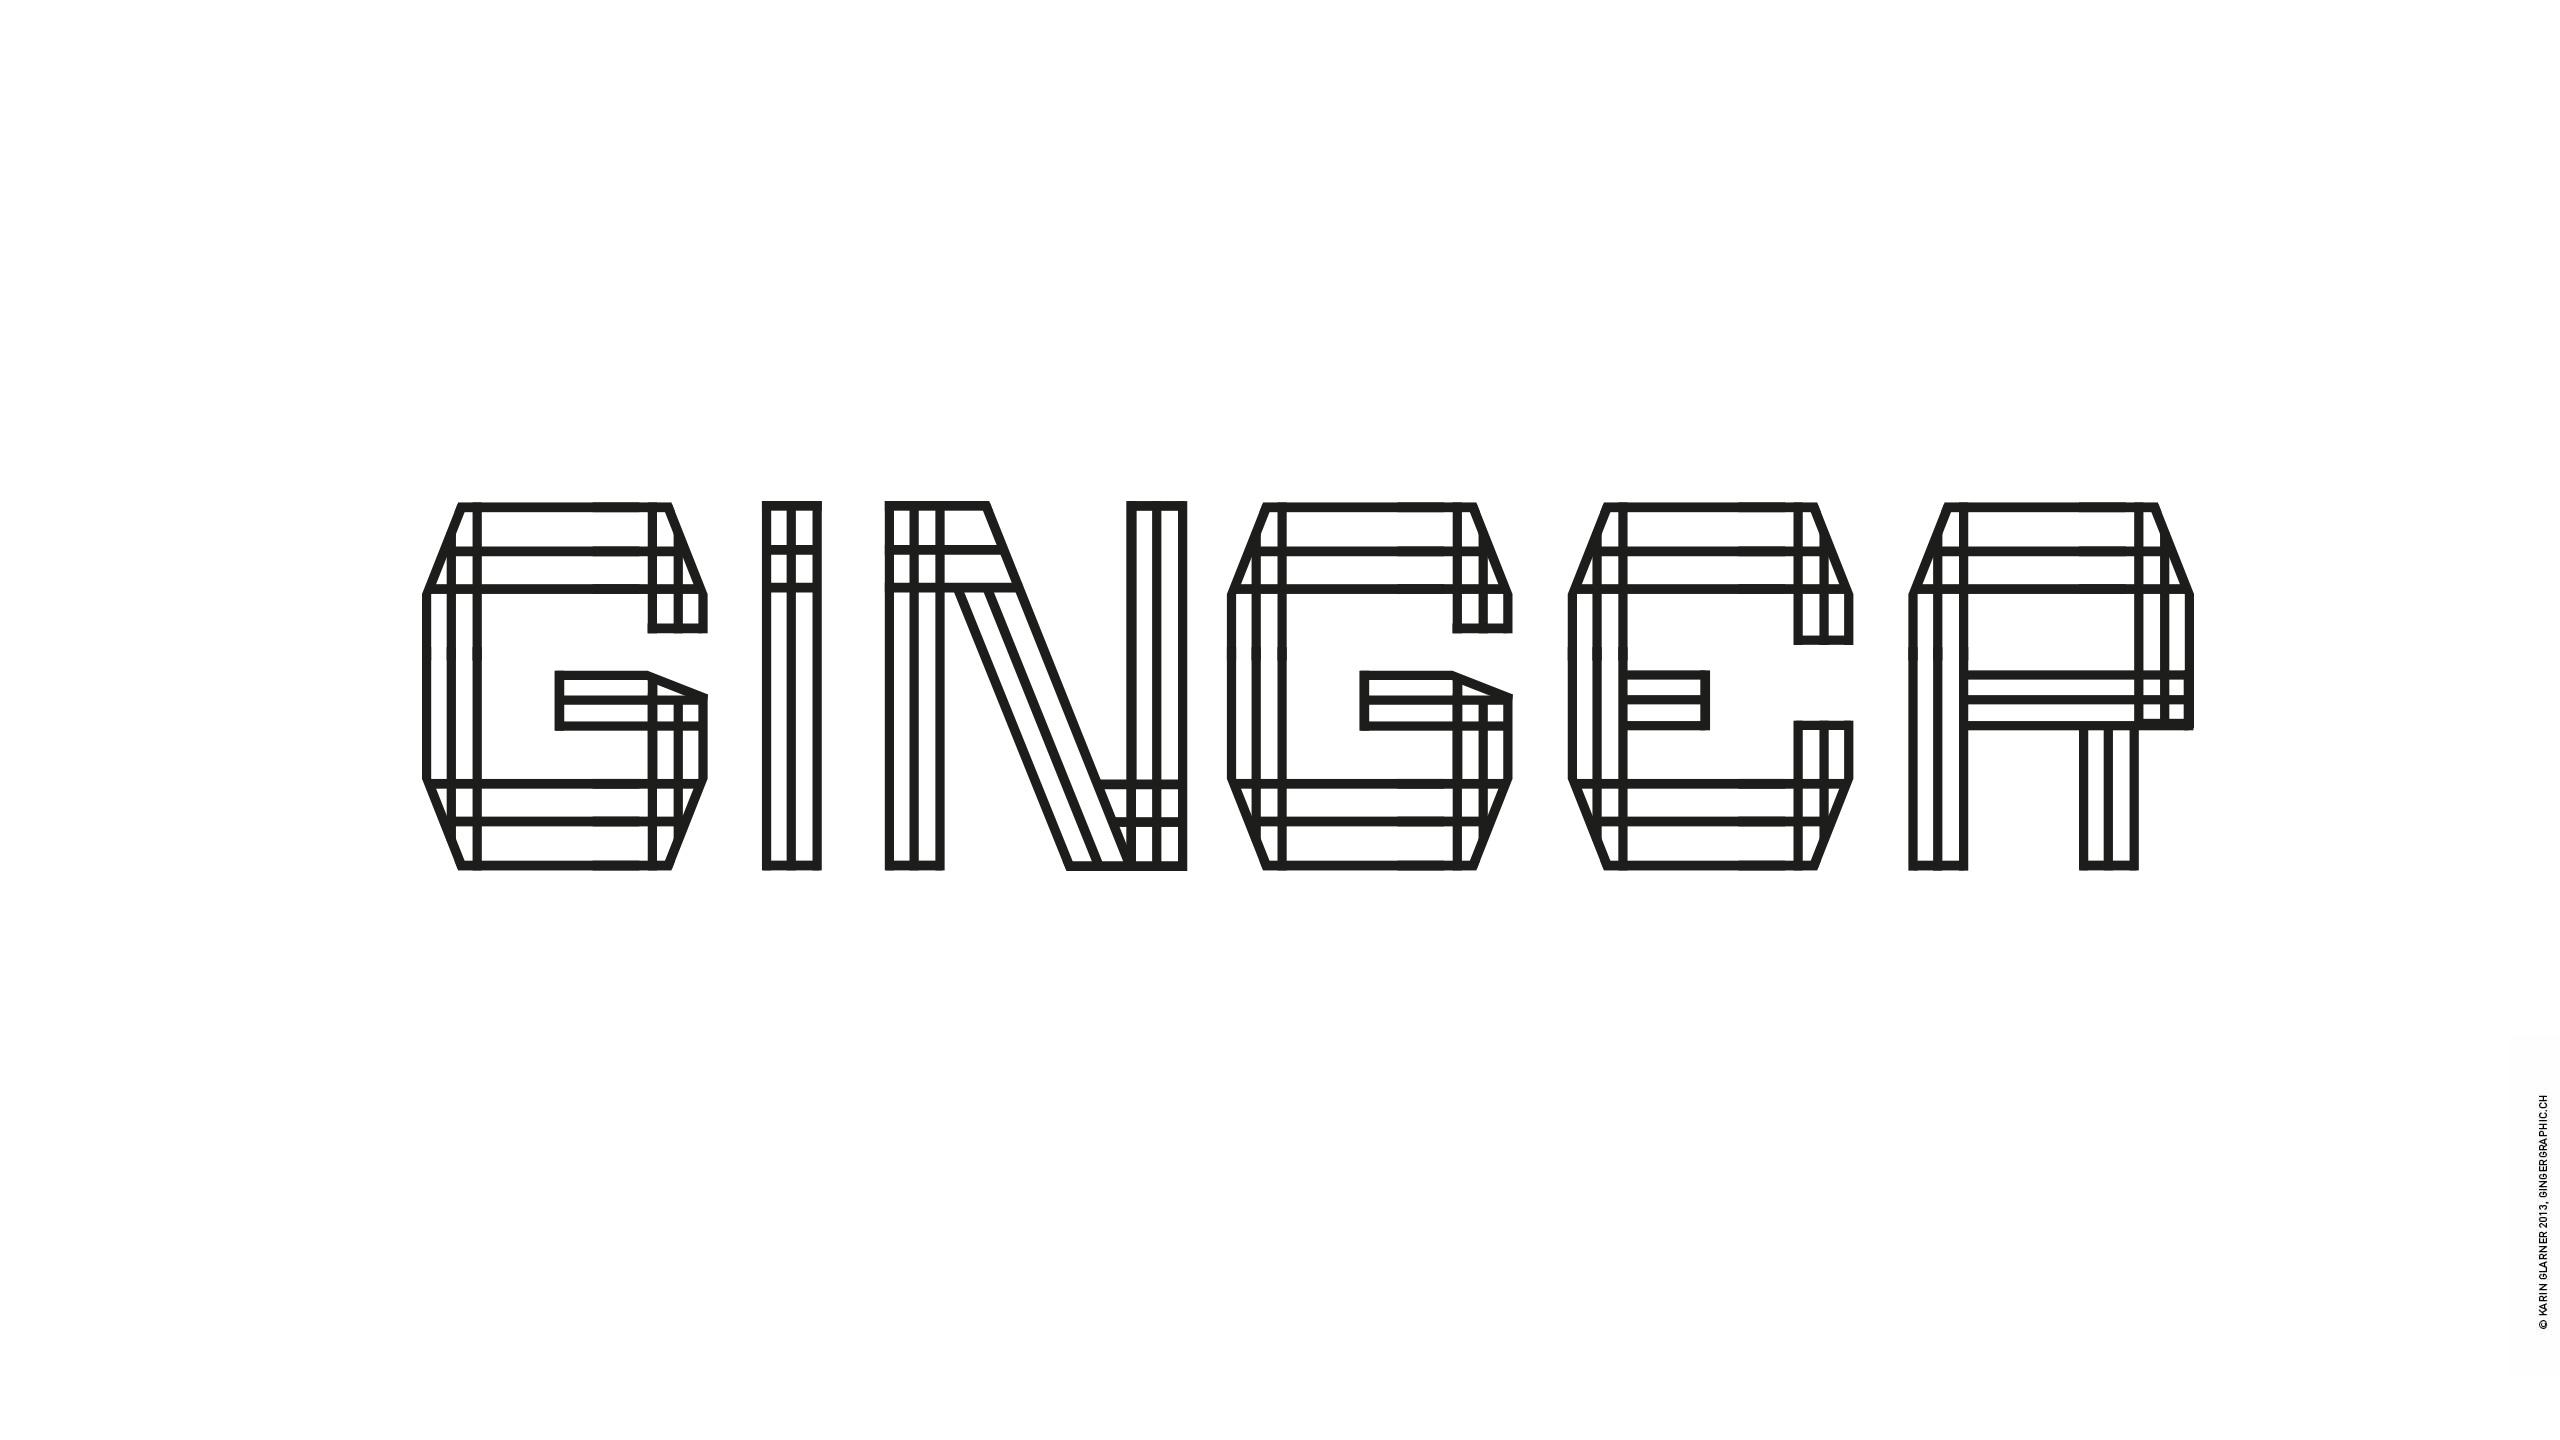 11_typo_gingergraphic_2560x1440x600dpi